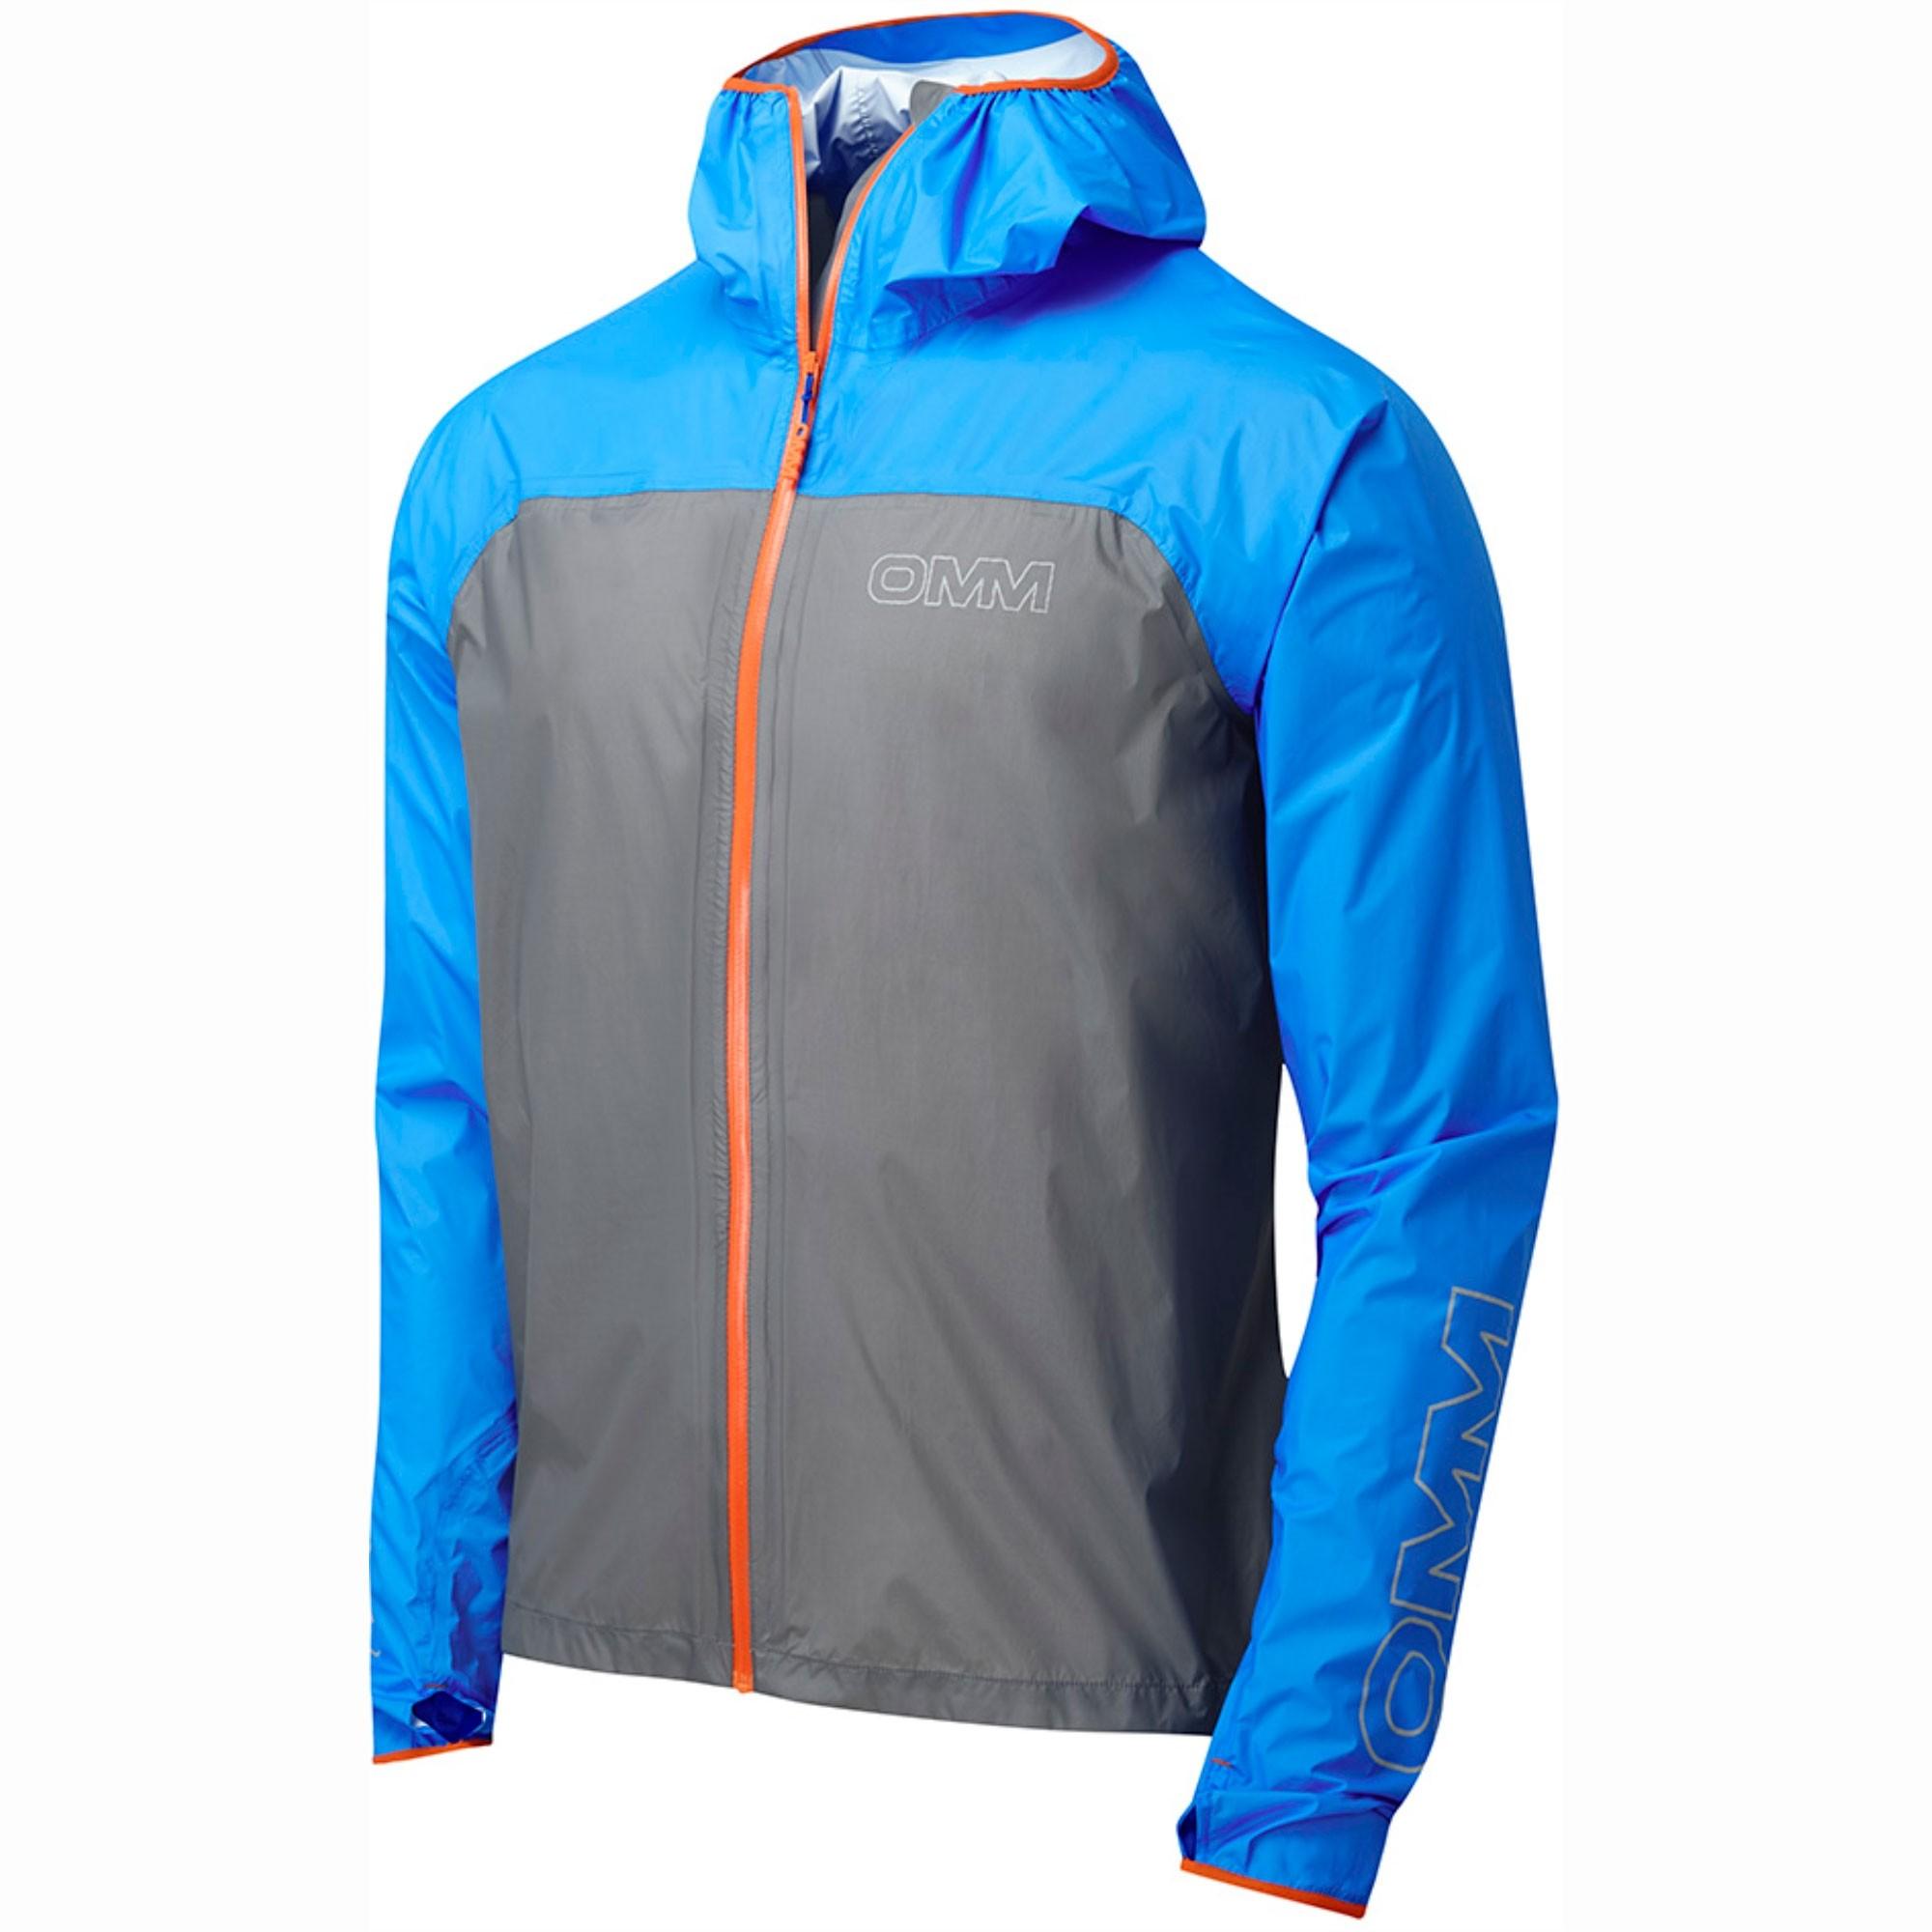 OMM Halo Waterproof Jacket - Grey/Blue